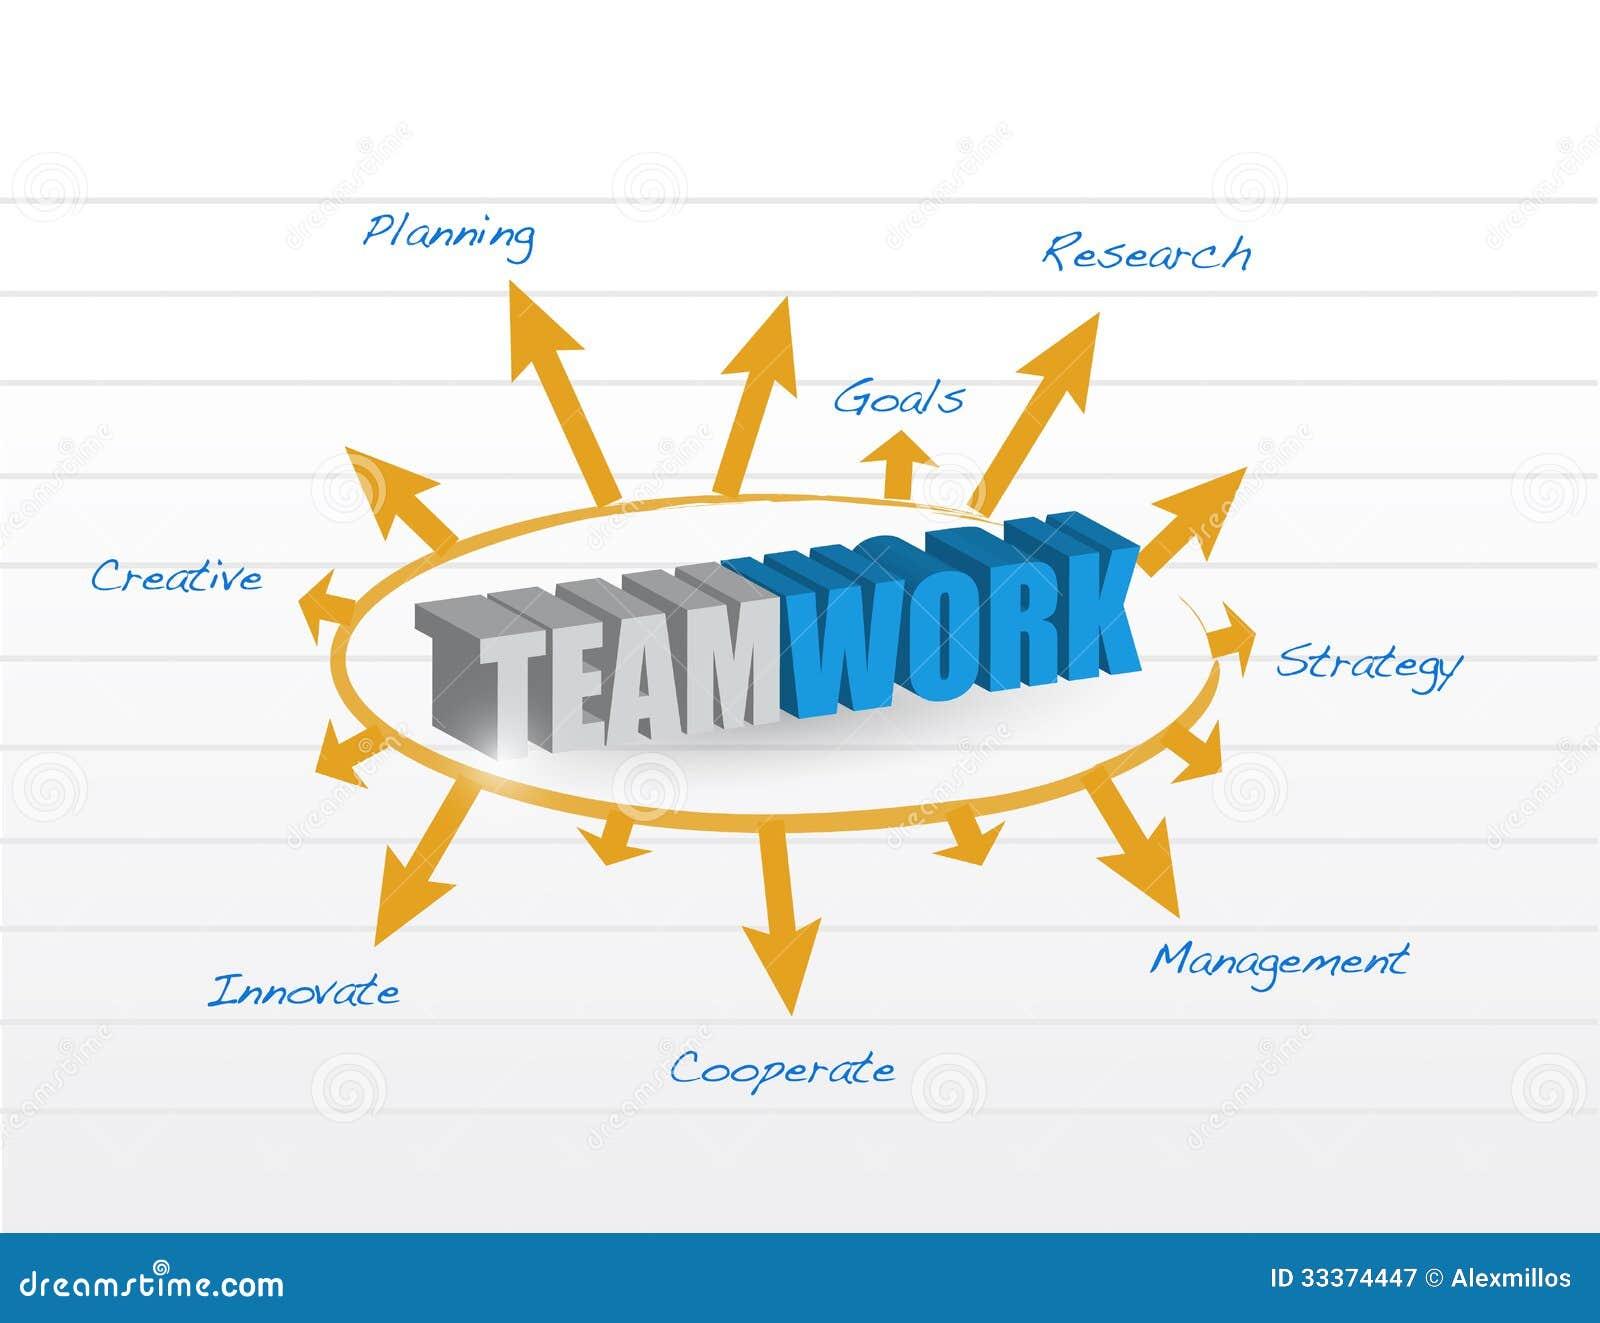 Model on teamwork